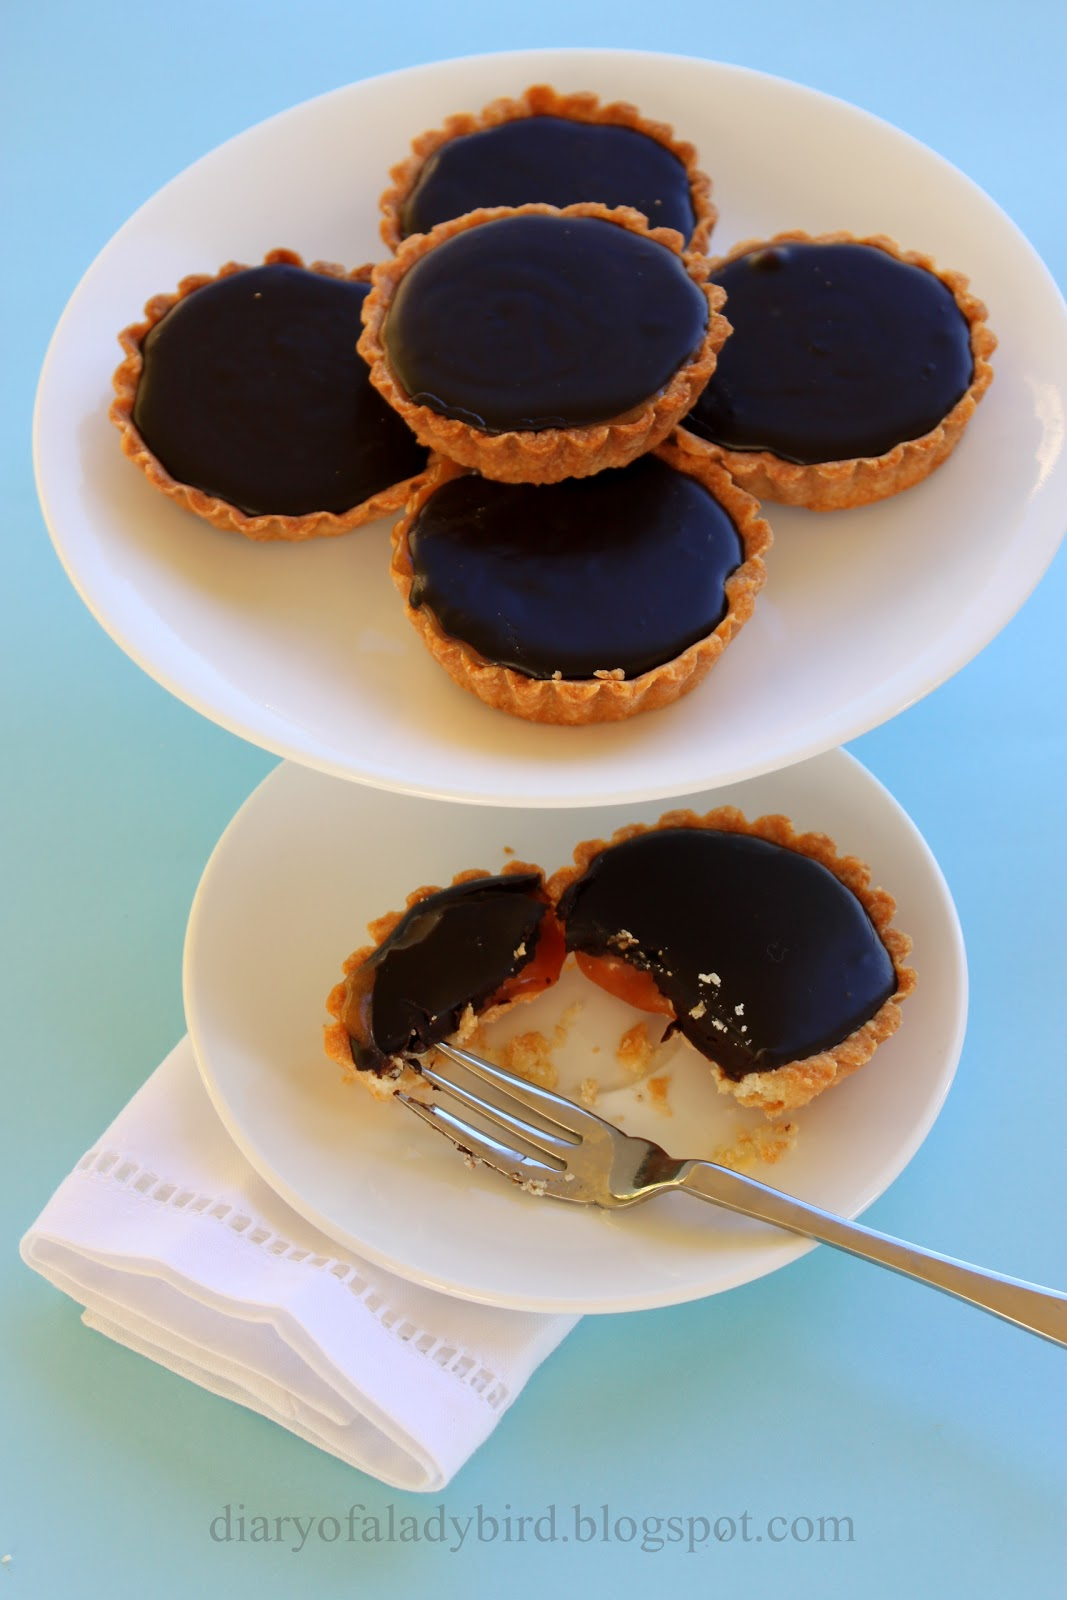 Diary of a Ladybird: Salted caramel, peanut and chocolate tarts